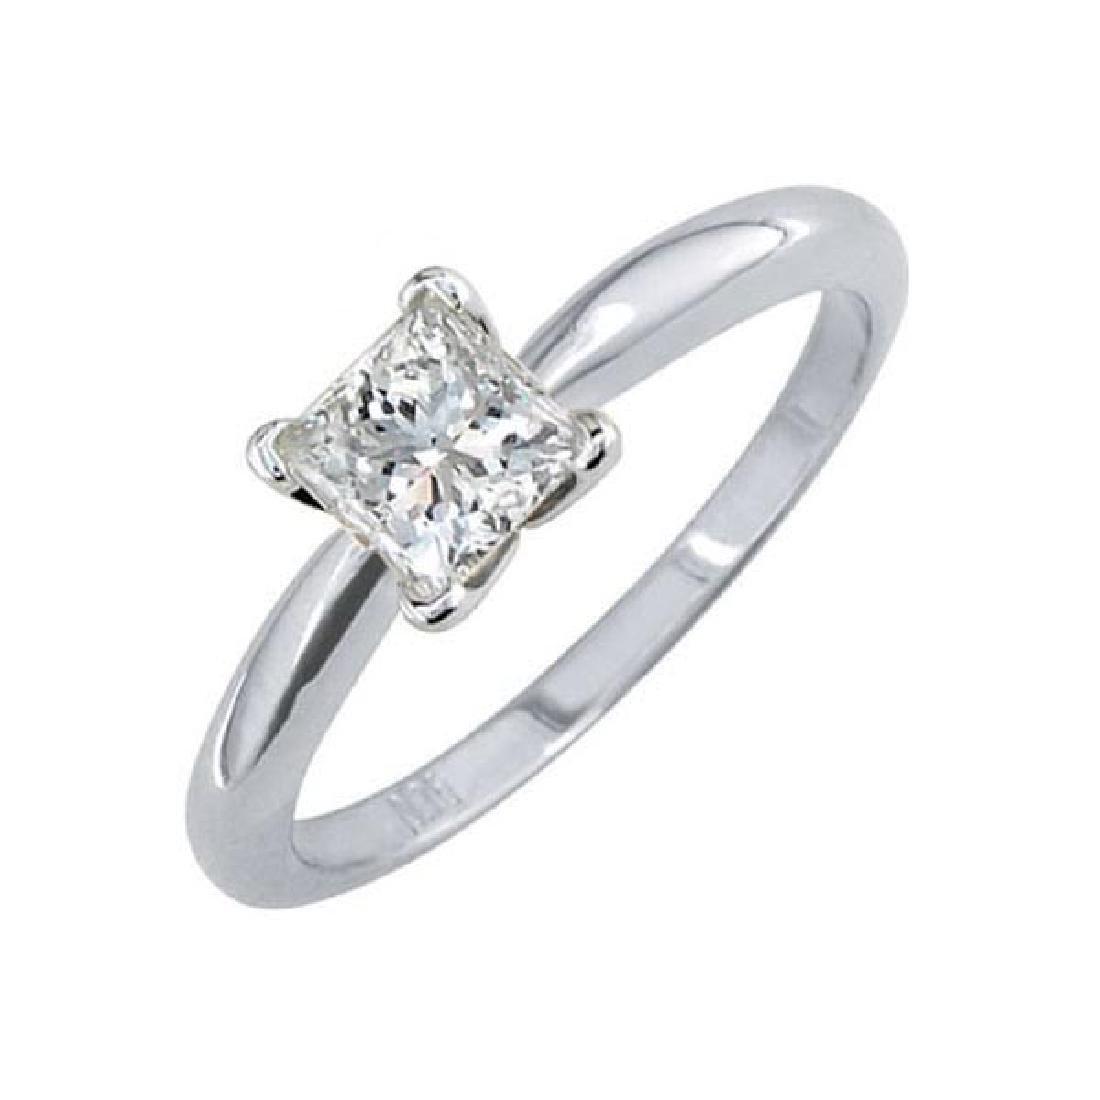 Certified 0.74 CTW Princess Diamond Solitaire 14k Ring